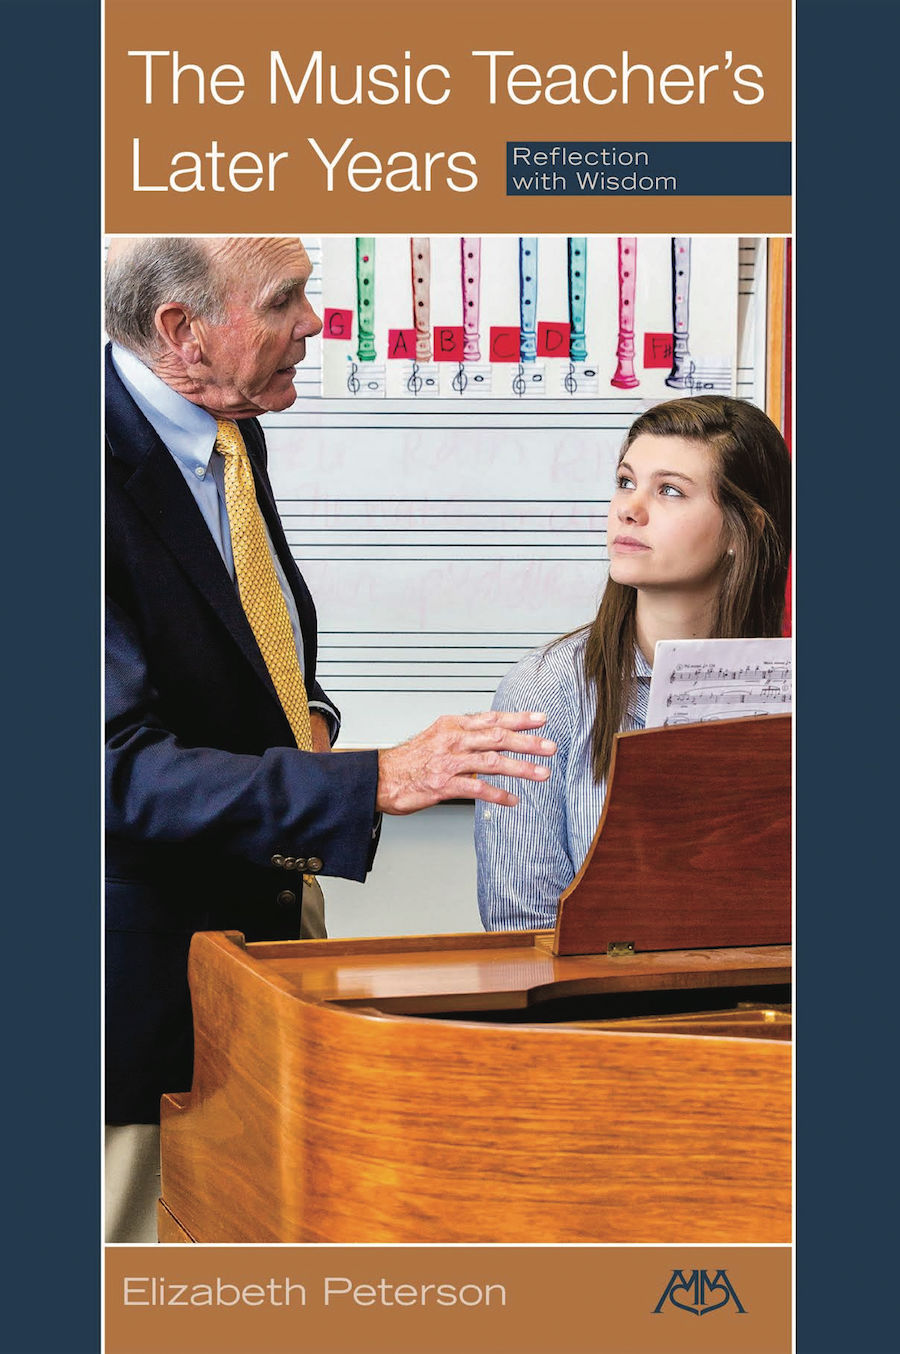 The Music Teacher's Later Years